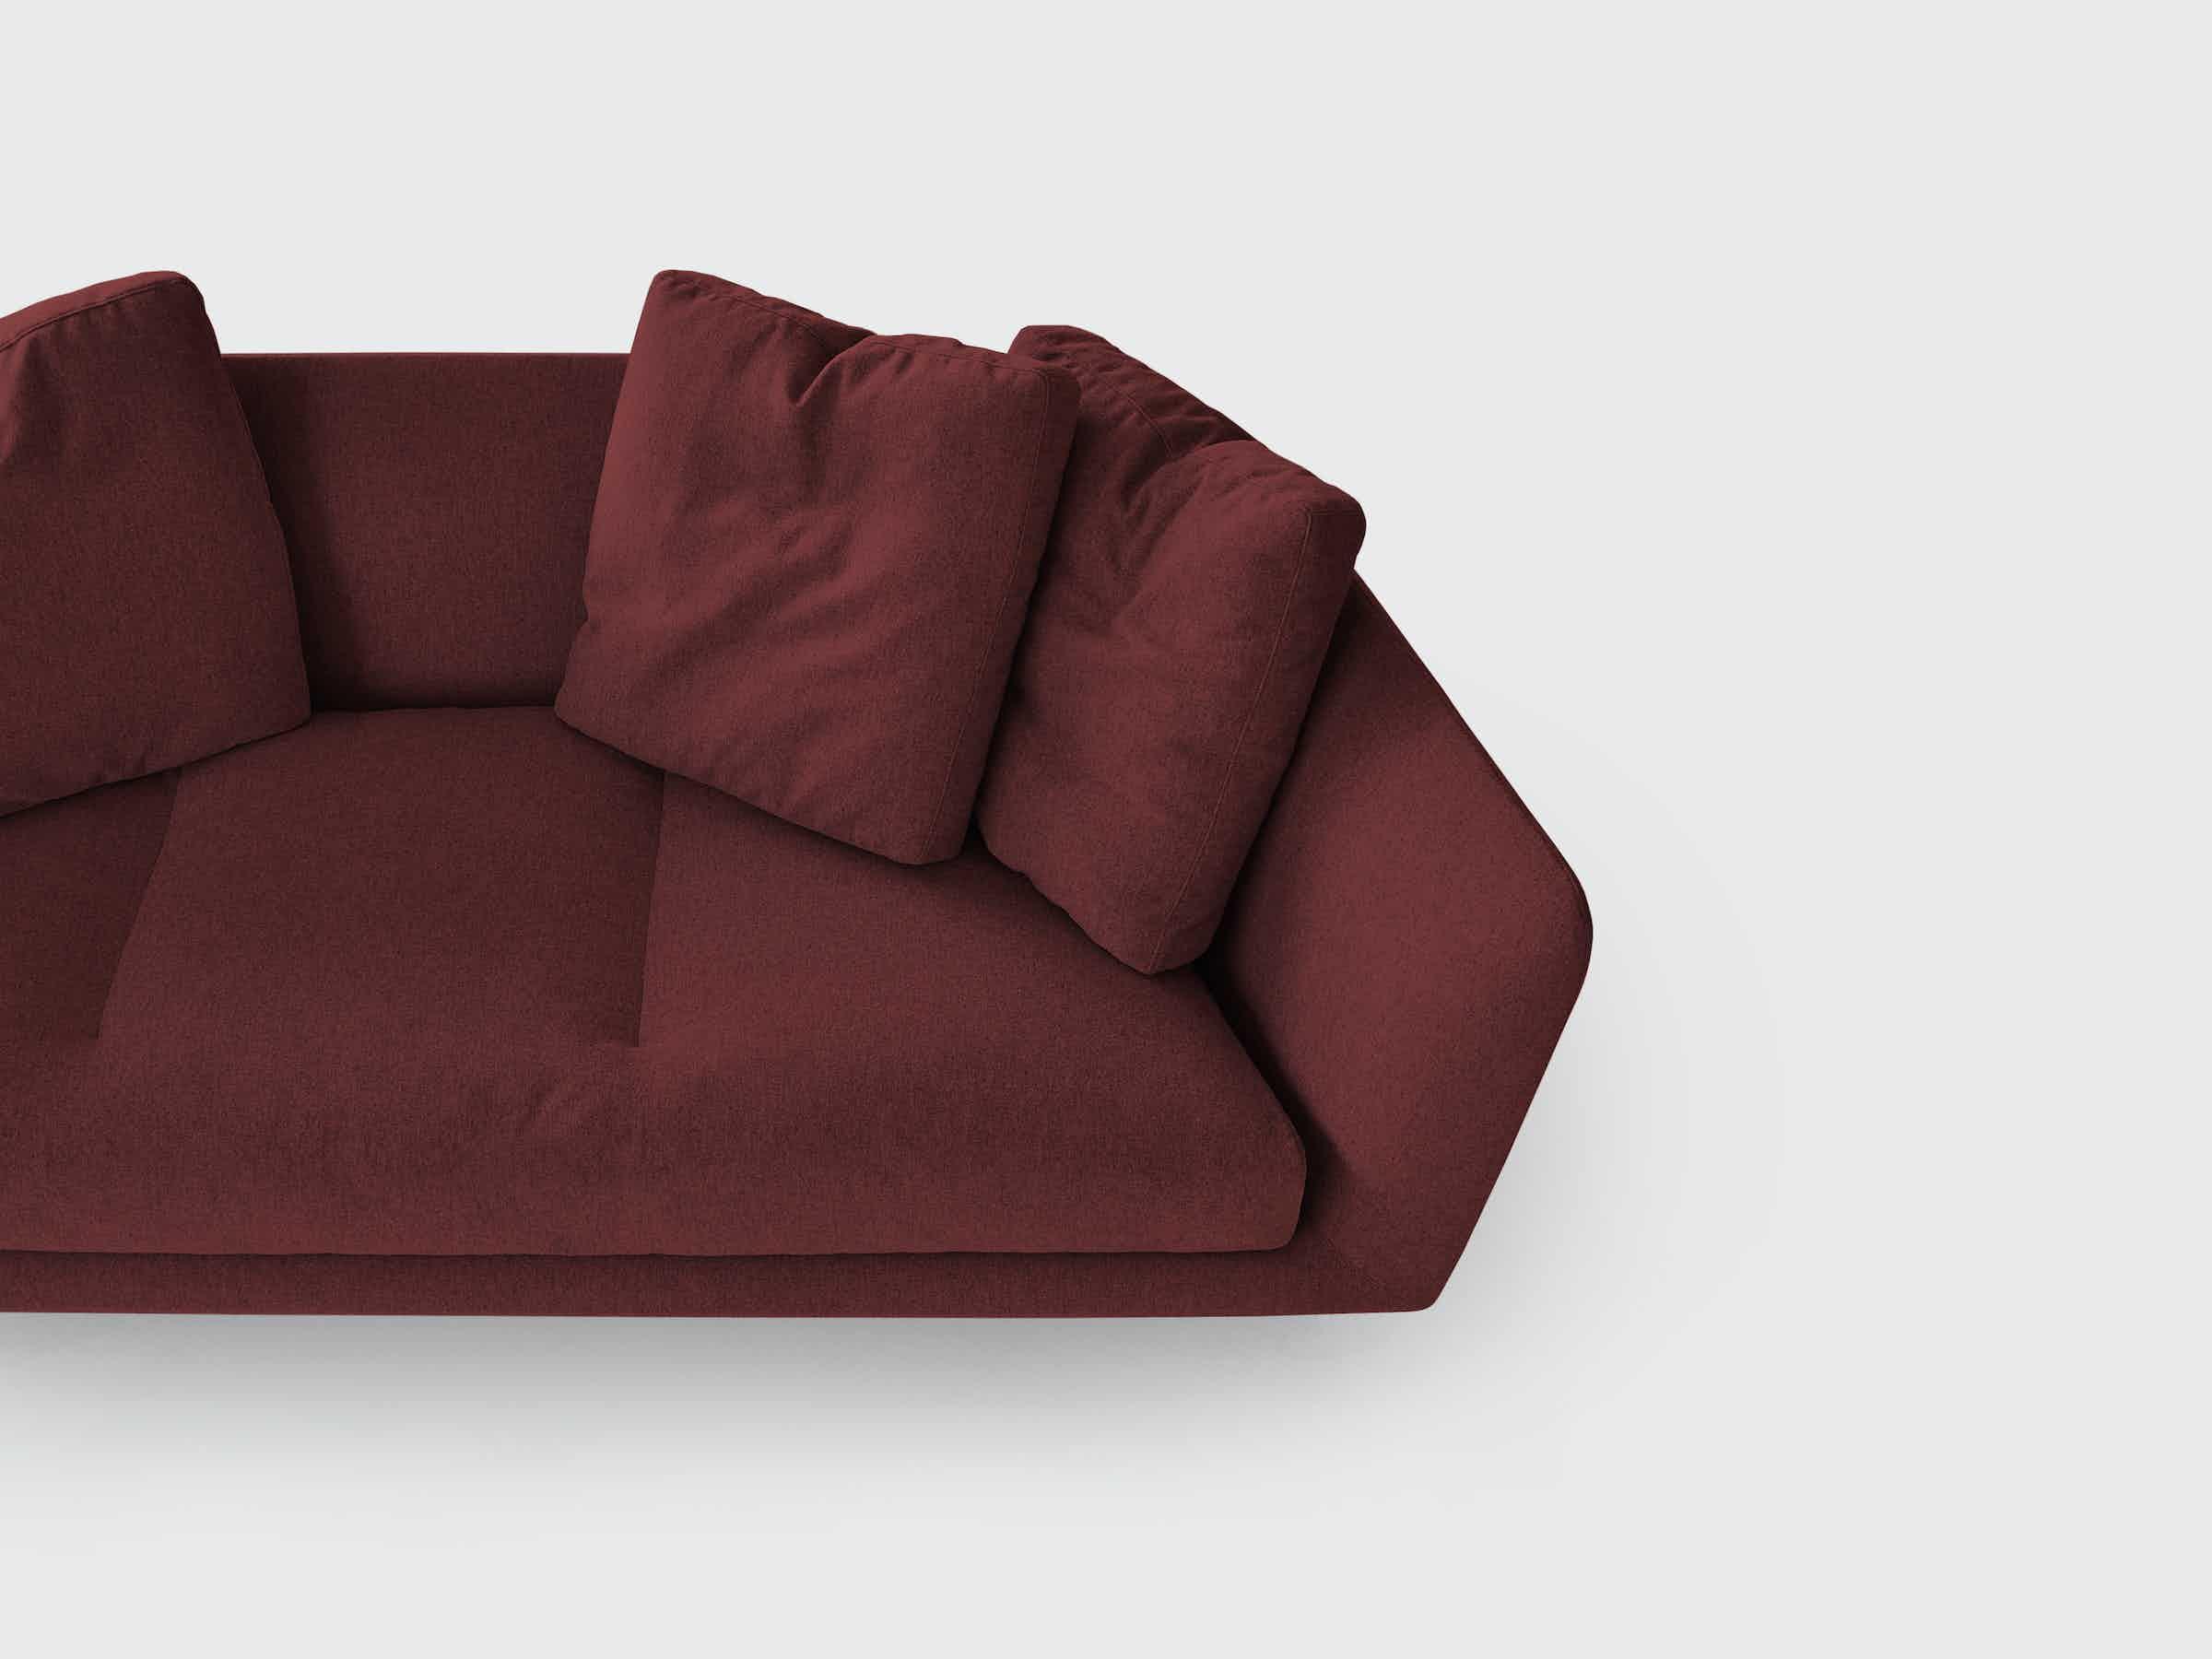 Bensen furniture aura sofa red side haute living